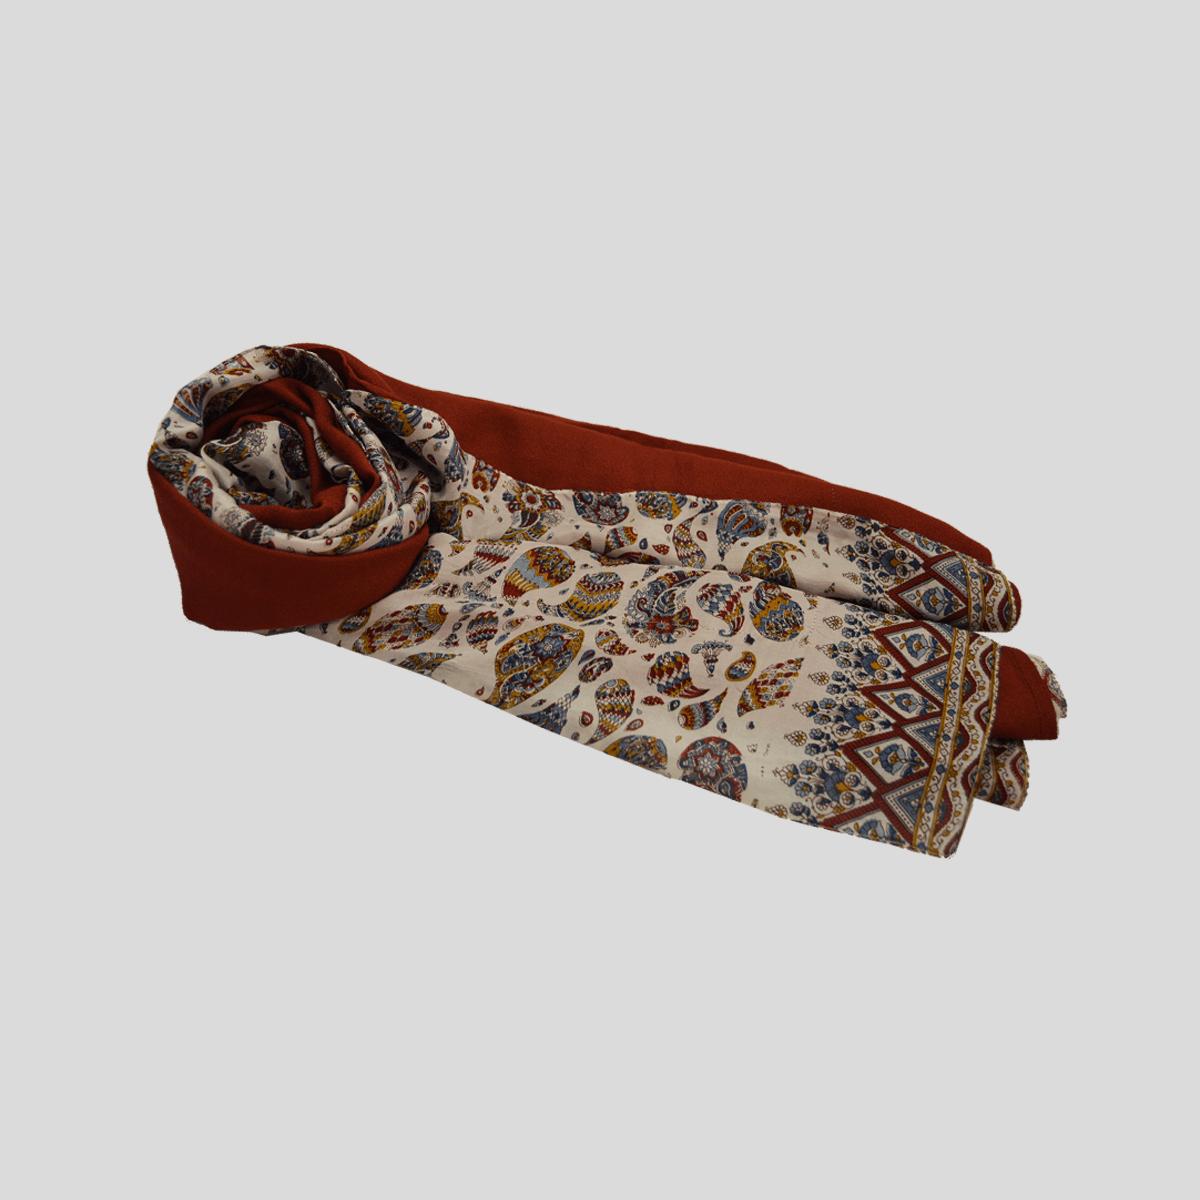 Pañuelo seda con viscosa